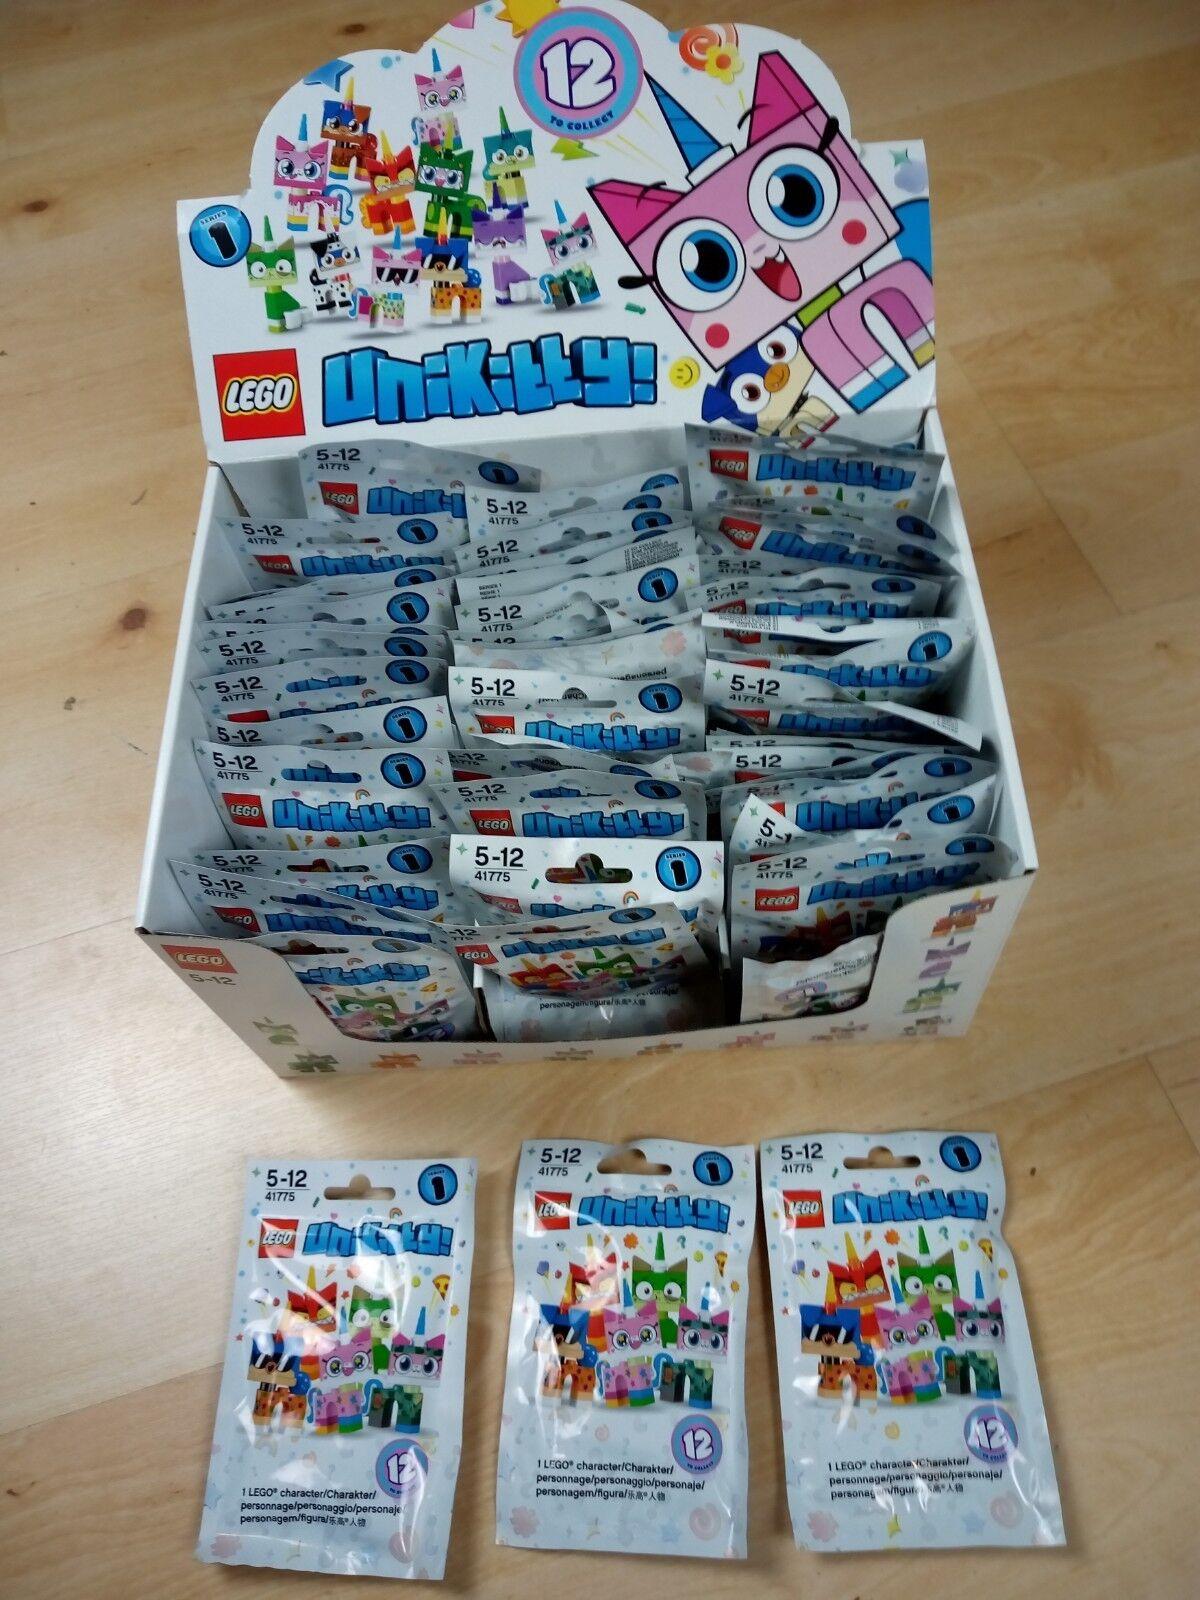 54 LEGO UNIKITTY    SERIES joblot a31135